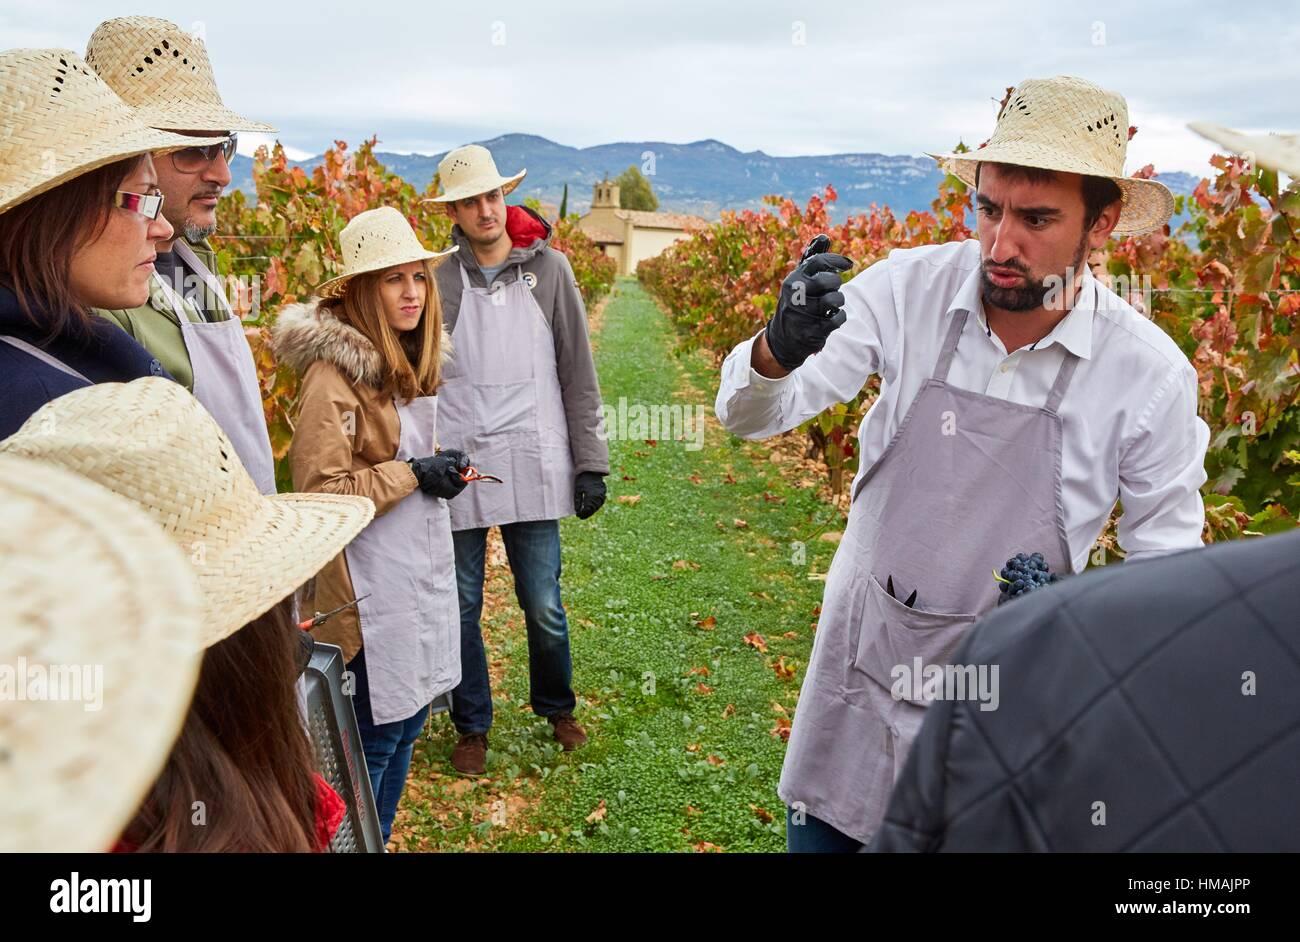 Grape harvest, Tourism in vintage practices in vineyards, Briones, La Rioja, Spain, Europe - Stock Image